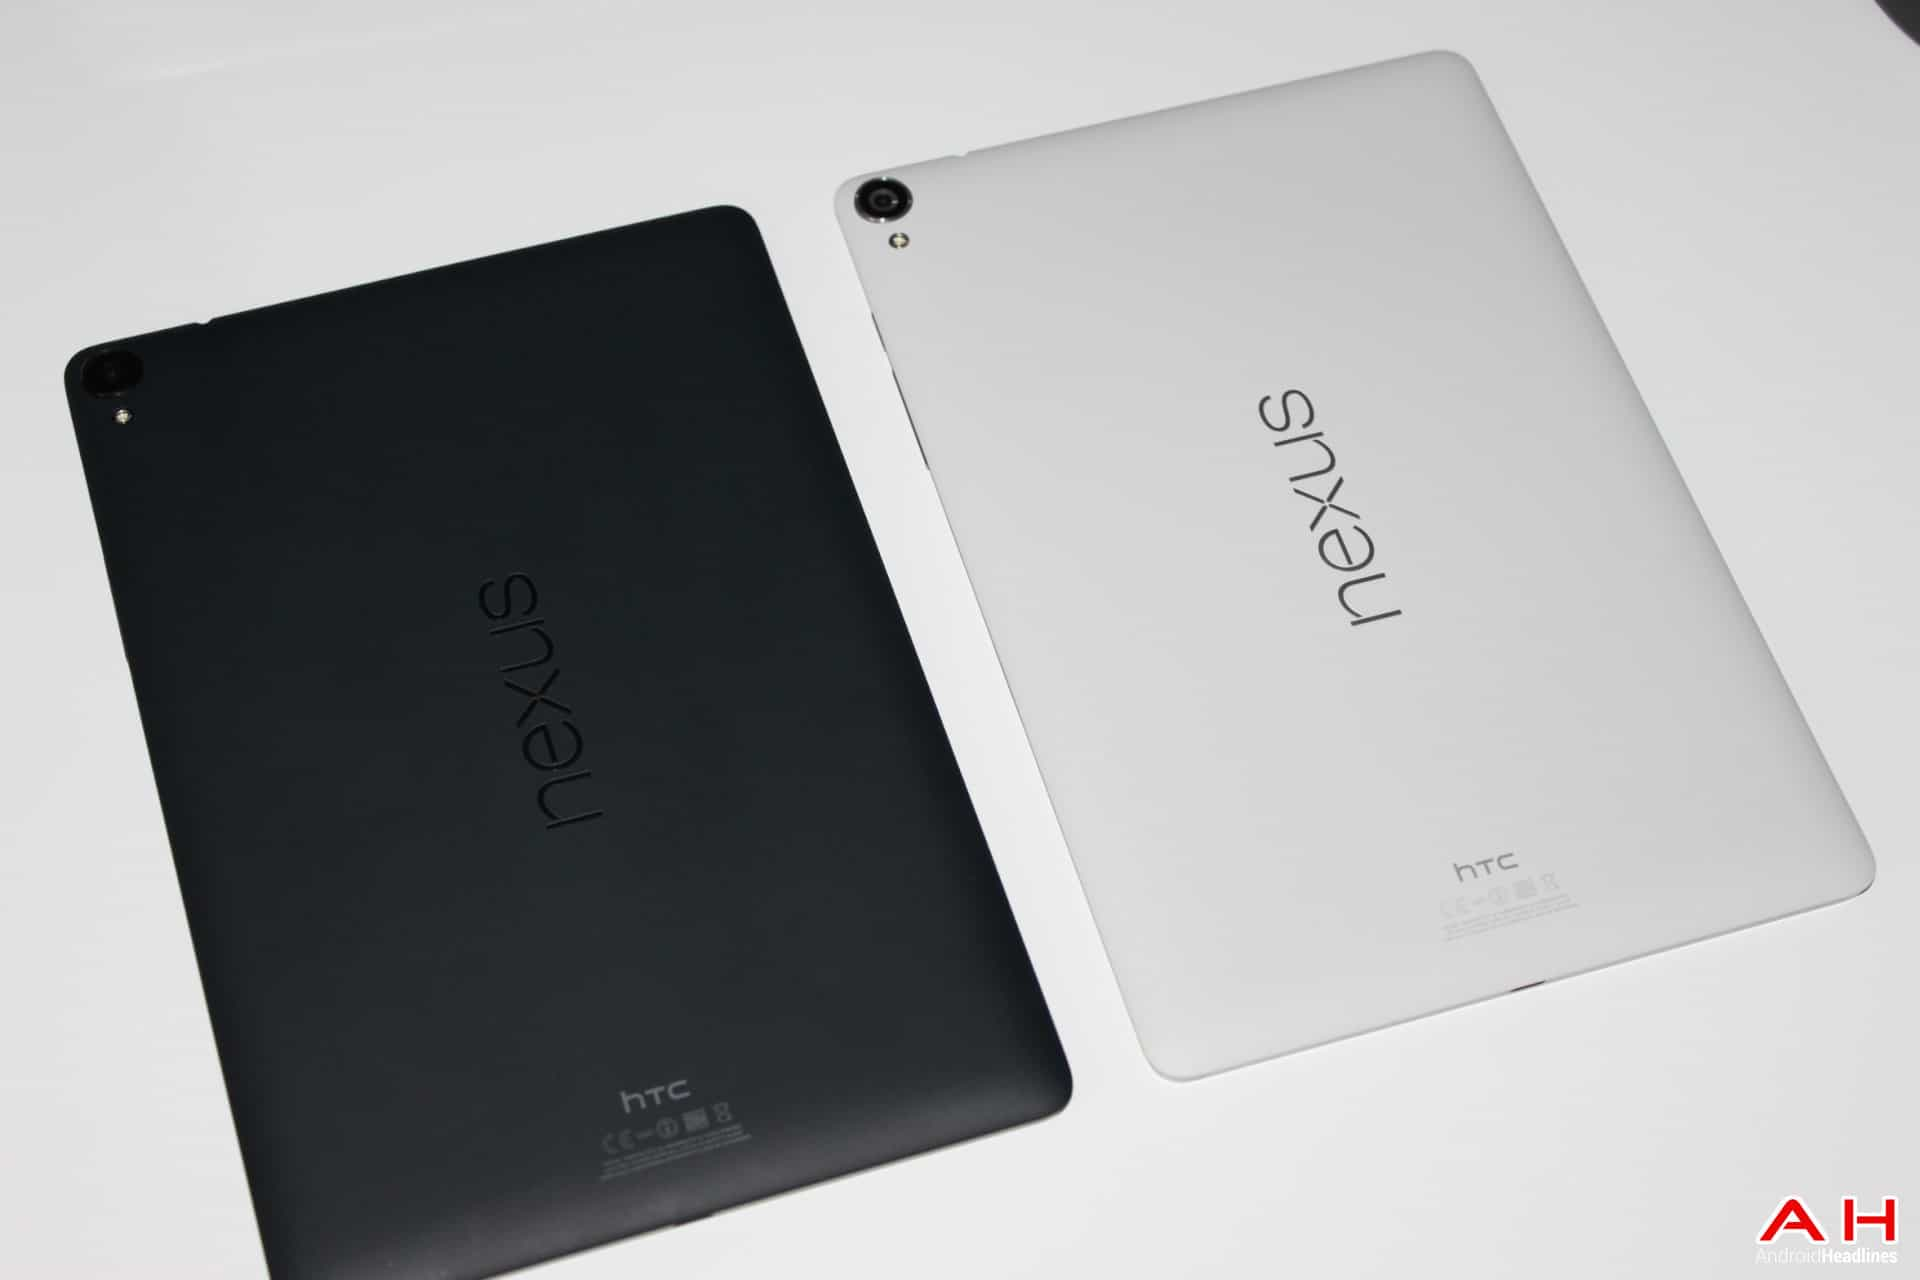 AH Nexus 9 5 back and white